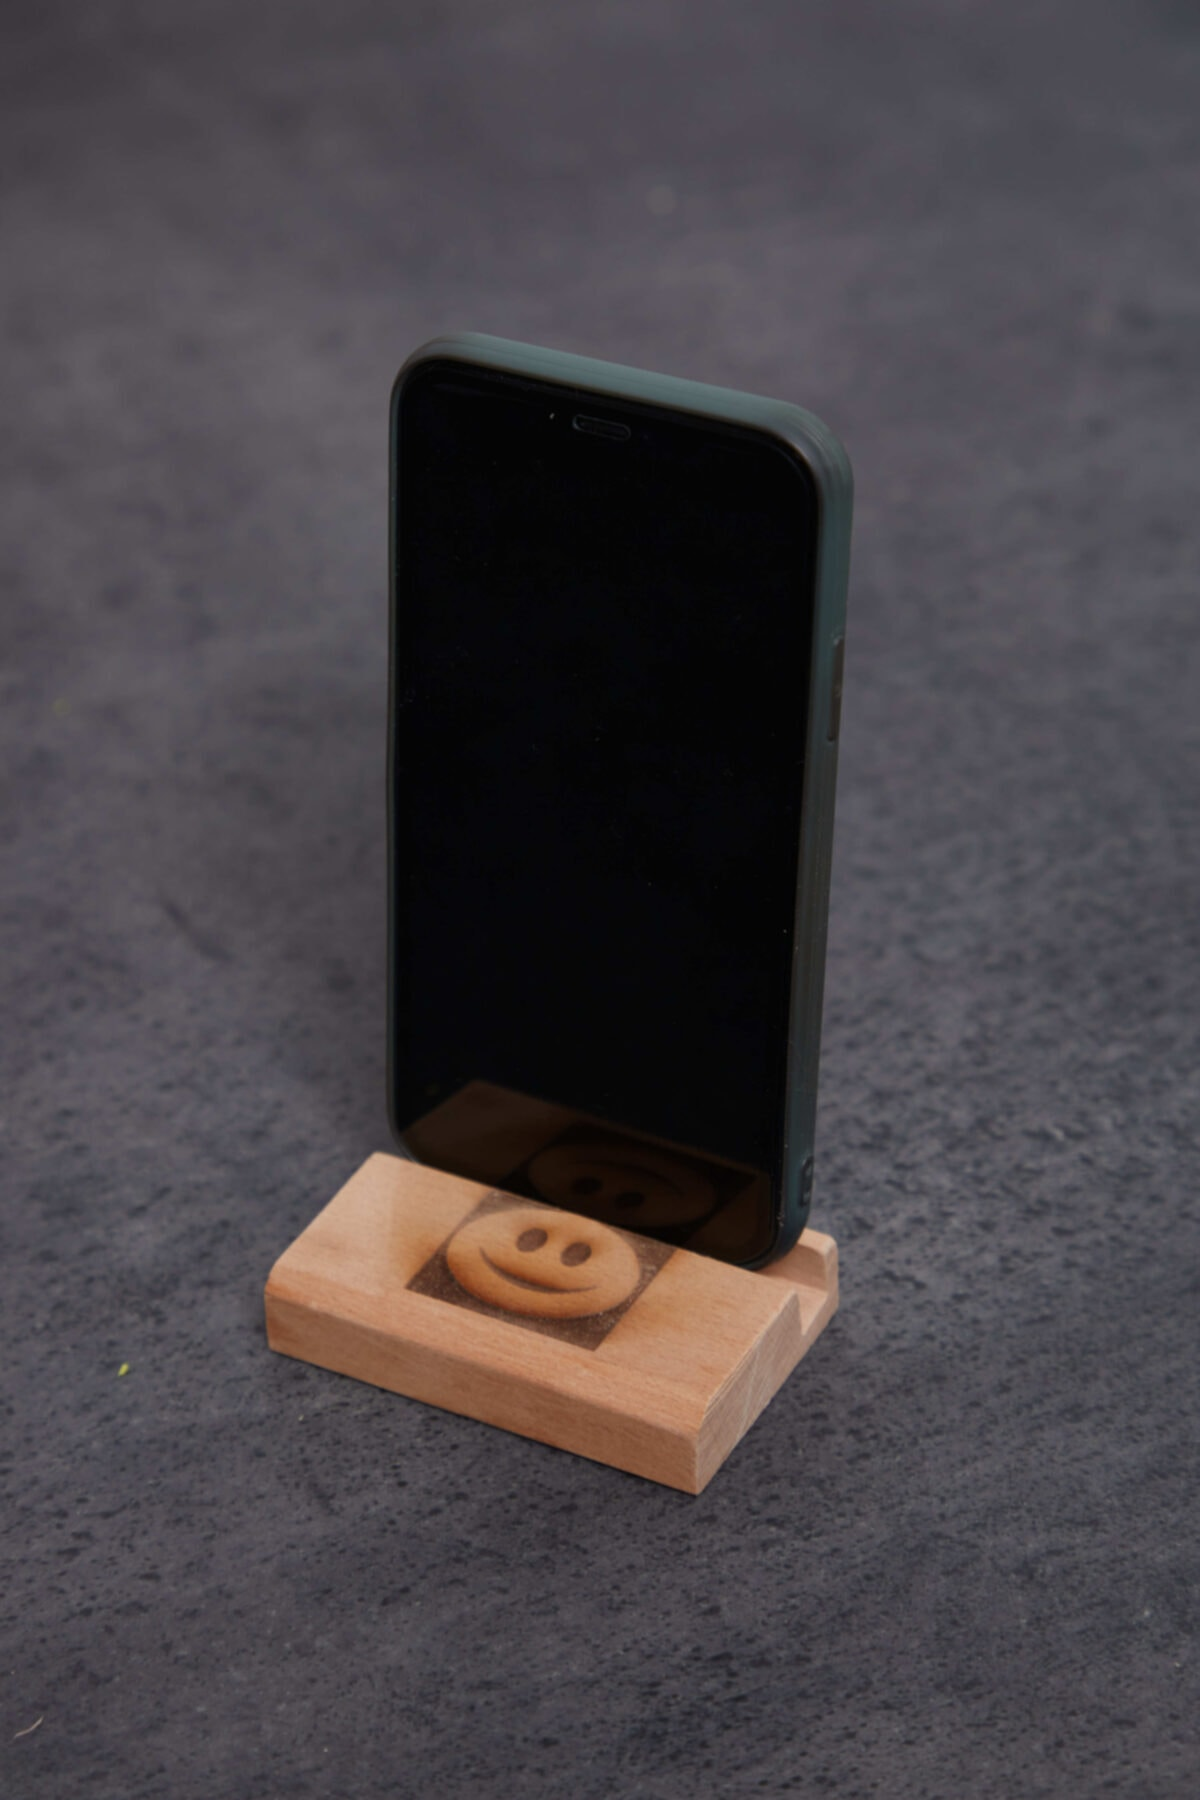 Artahşap Ahşap Masaüstü Telefon Tablet Tutucu 1